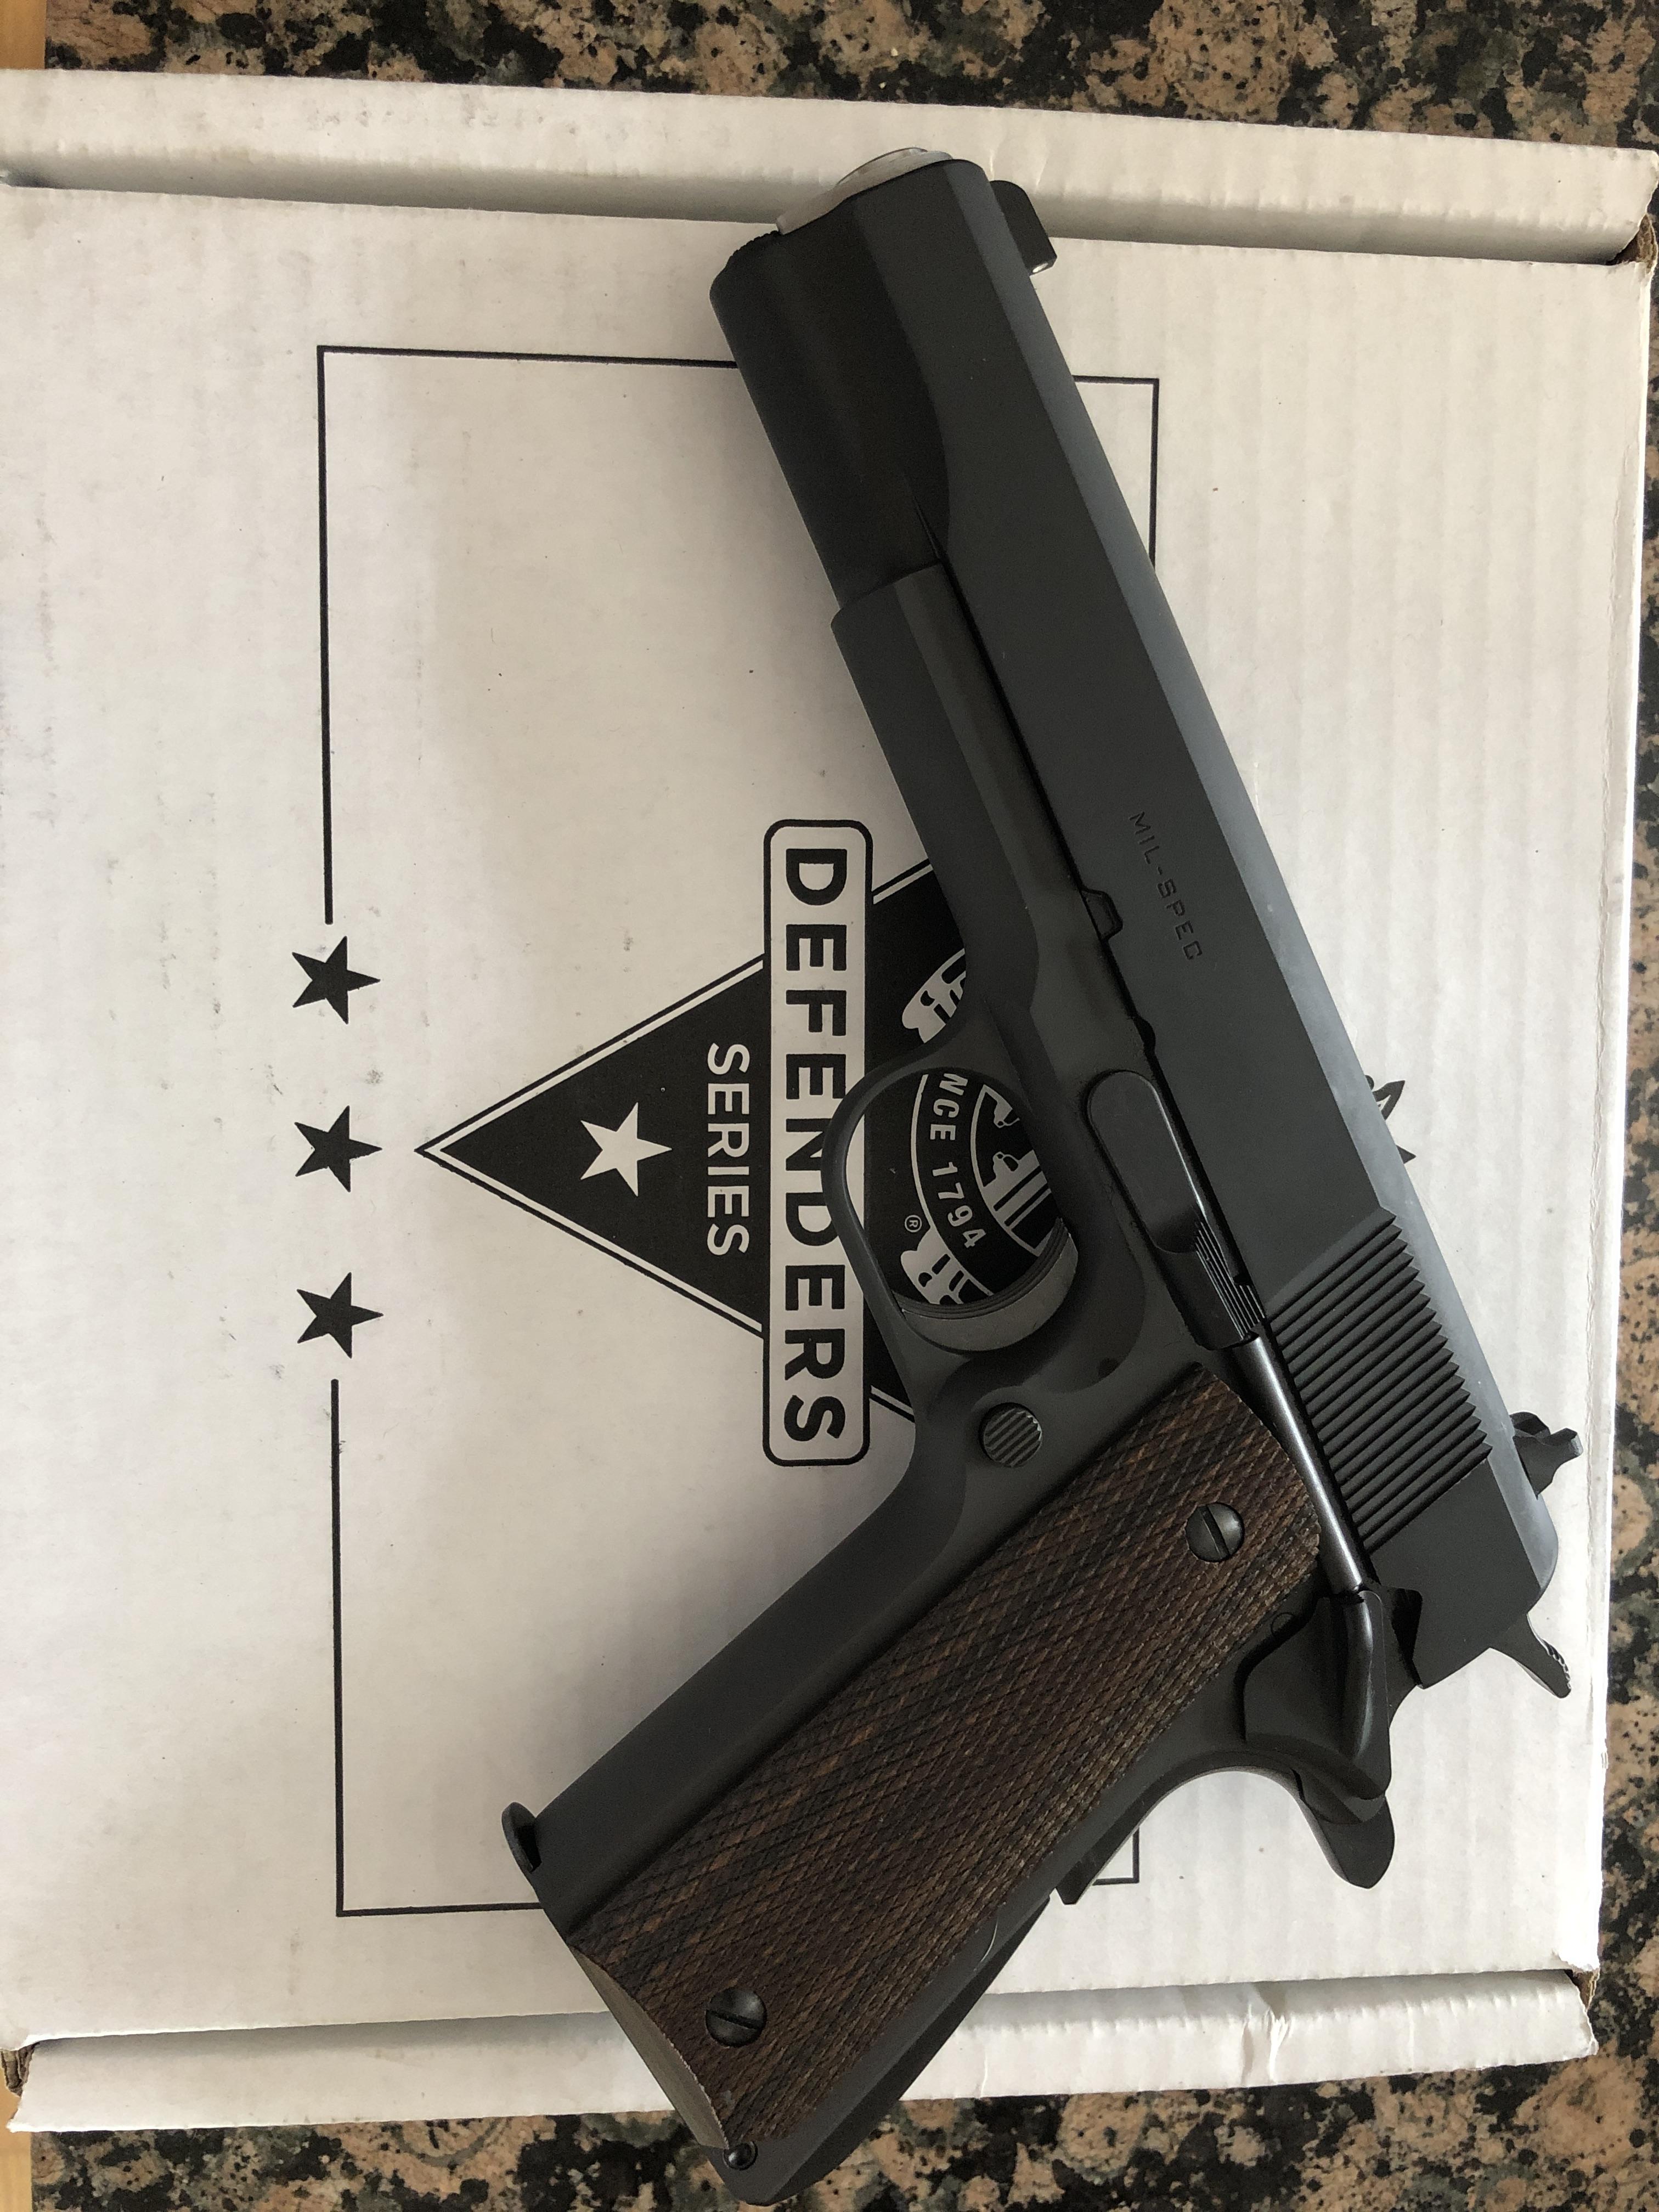 Springfield defender 1911 mil-spec — gunsandammo